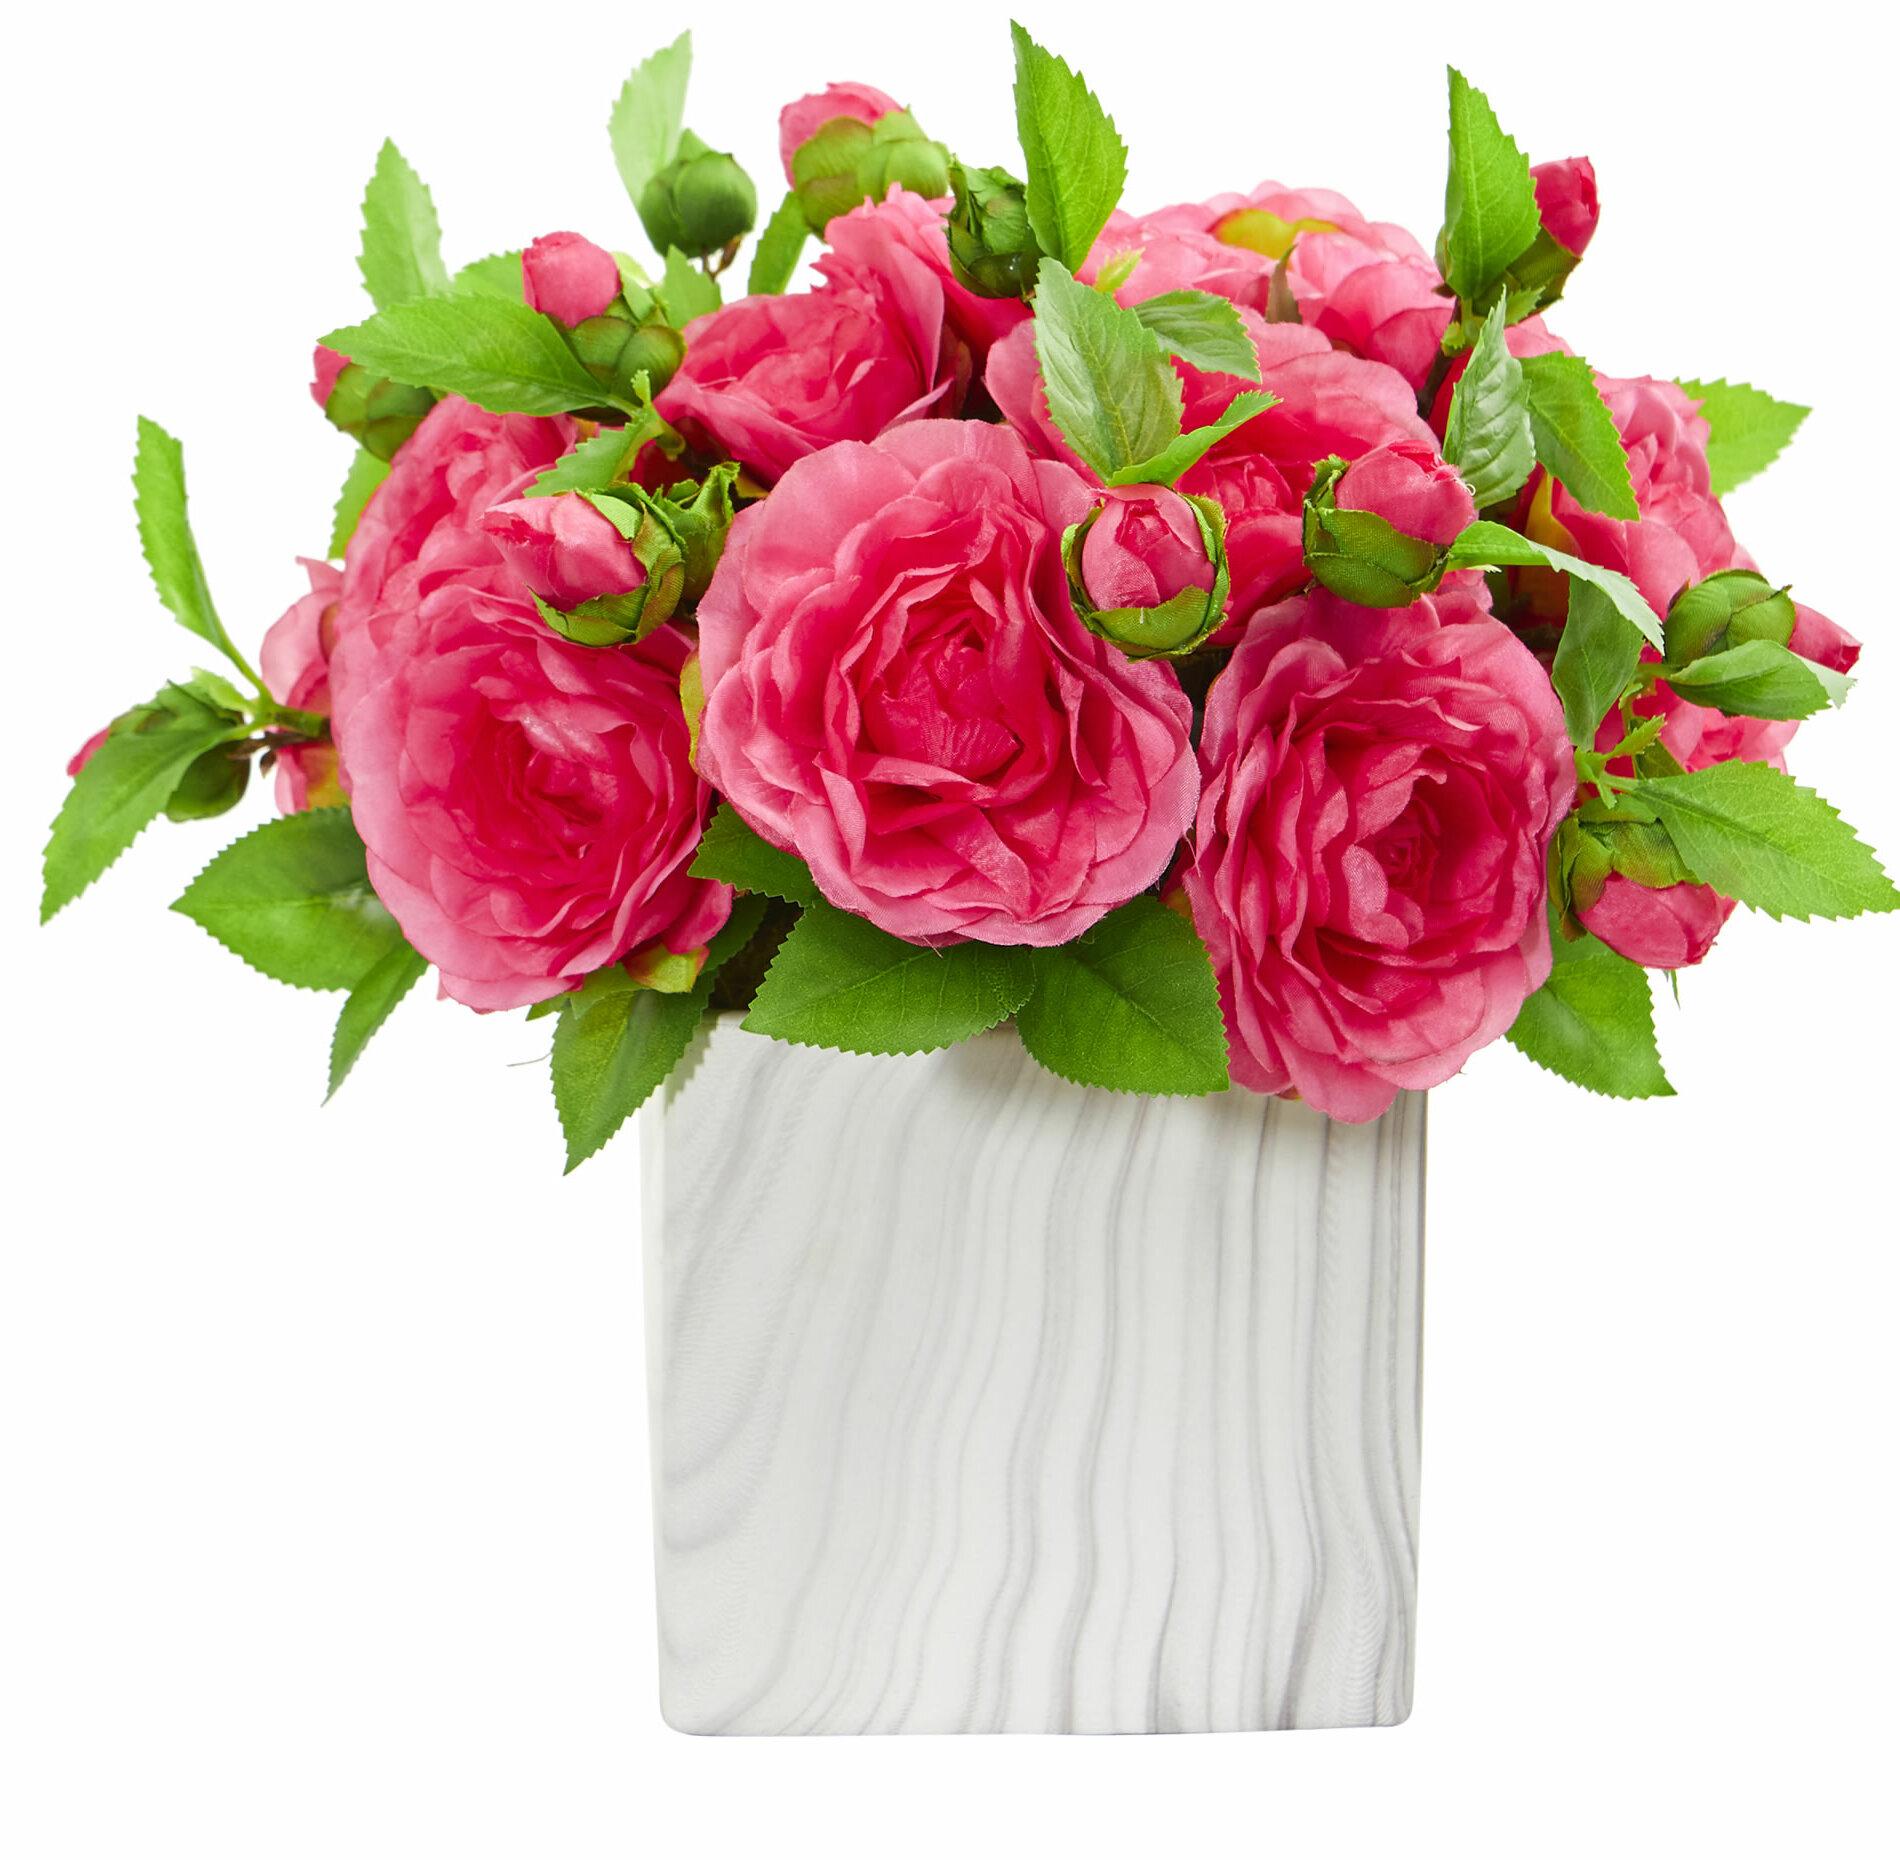 5 Carnations FUCHSIA PINK Silk Wedding Bouquet Centerpieces Flowers Decoration